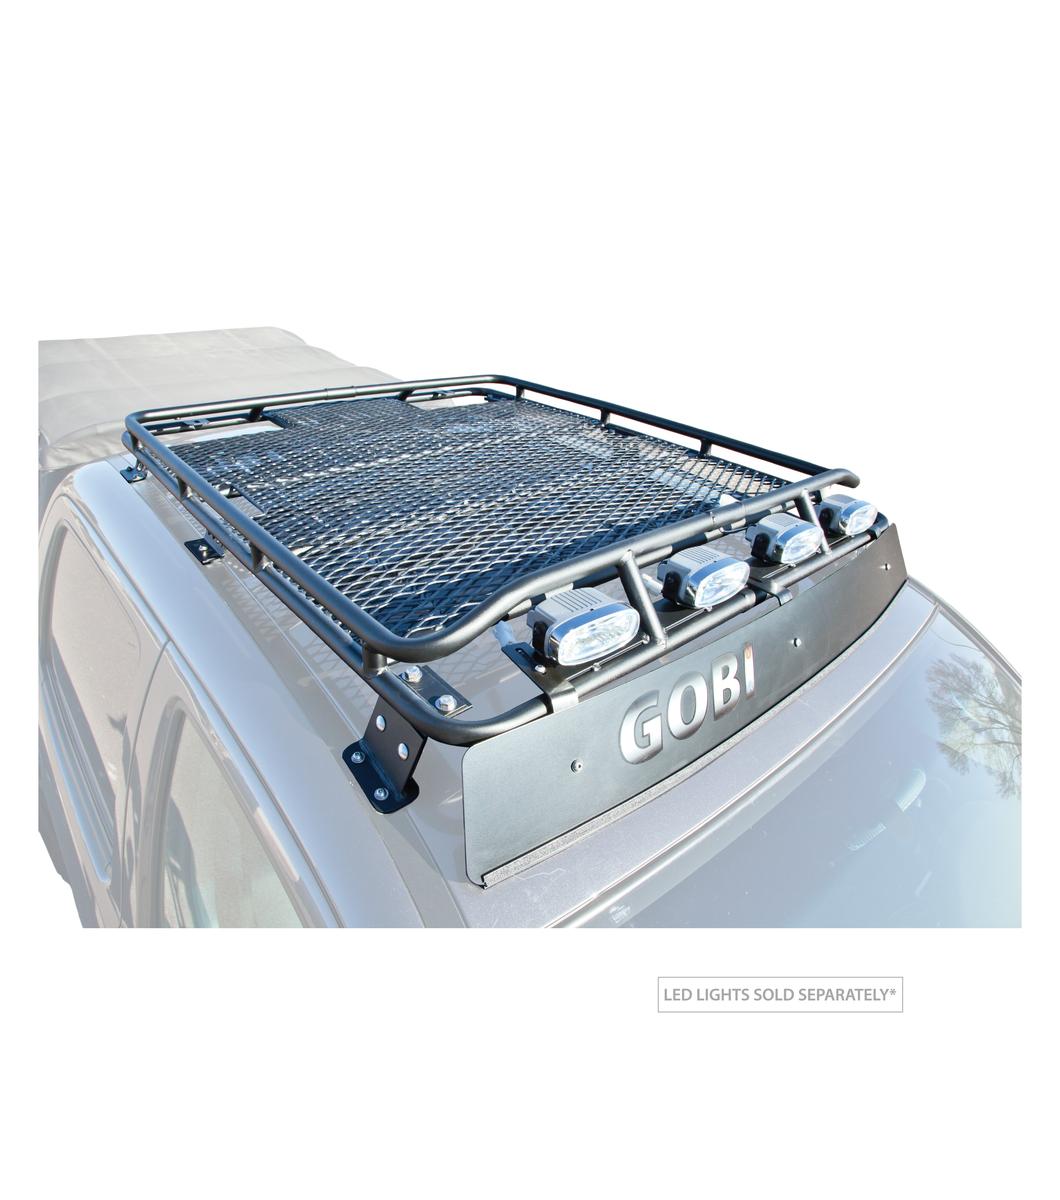 Gobi Toyota Tacoma Stealth Rack Multi Light Setup